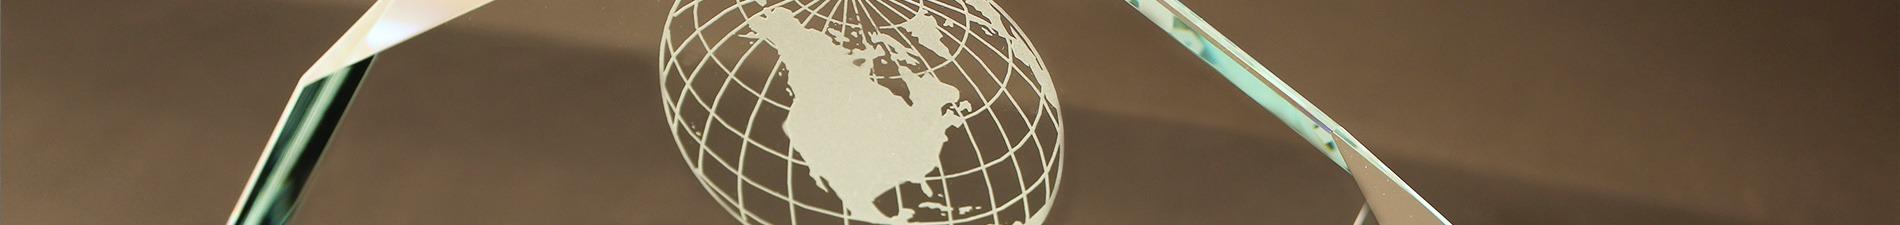 Header image closeup of sandcarved award with globe